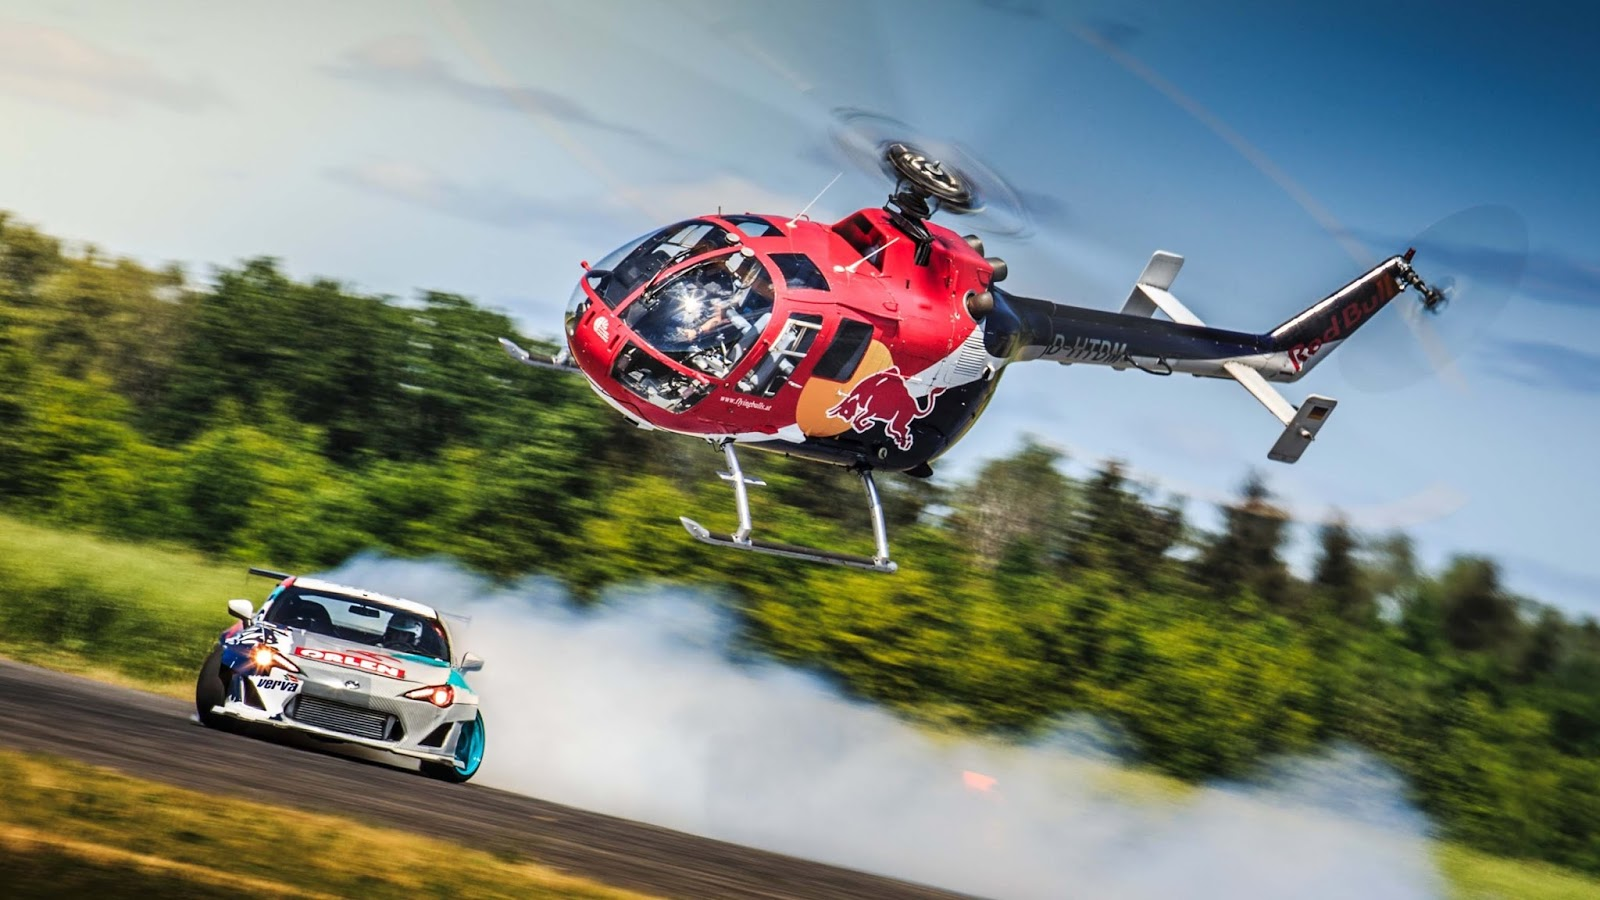 redbull Είναι τρελοί εκεί στη Red Bull : Ελικόπτερο εναντίον drift car drift, Felix Baumgartner, Fun, Jakub Przygoński, Red Bull, Toyota, Toyota GT 86, videos